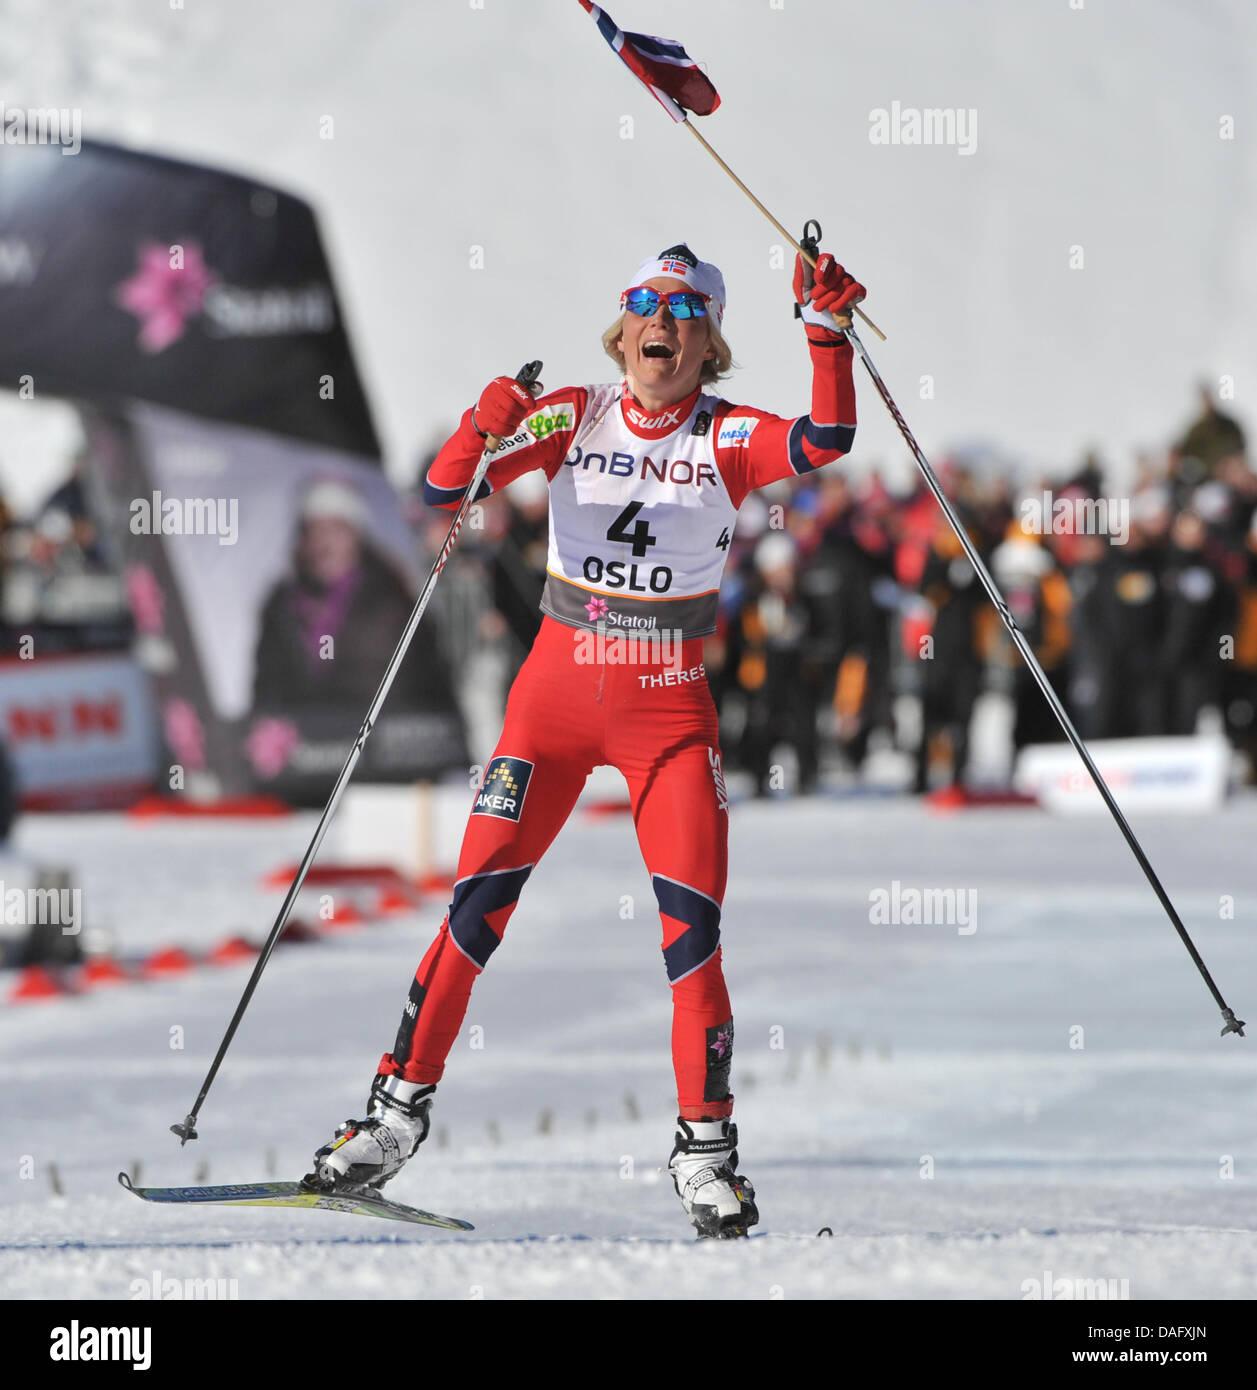 Therese Johaug Of Norway Celebrates Winningthe Cross Country Skiing Stock Photo Alamy